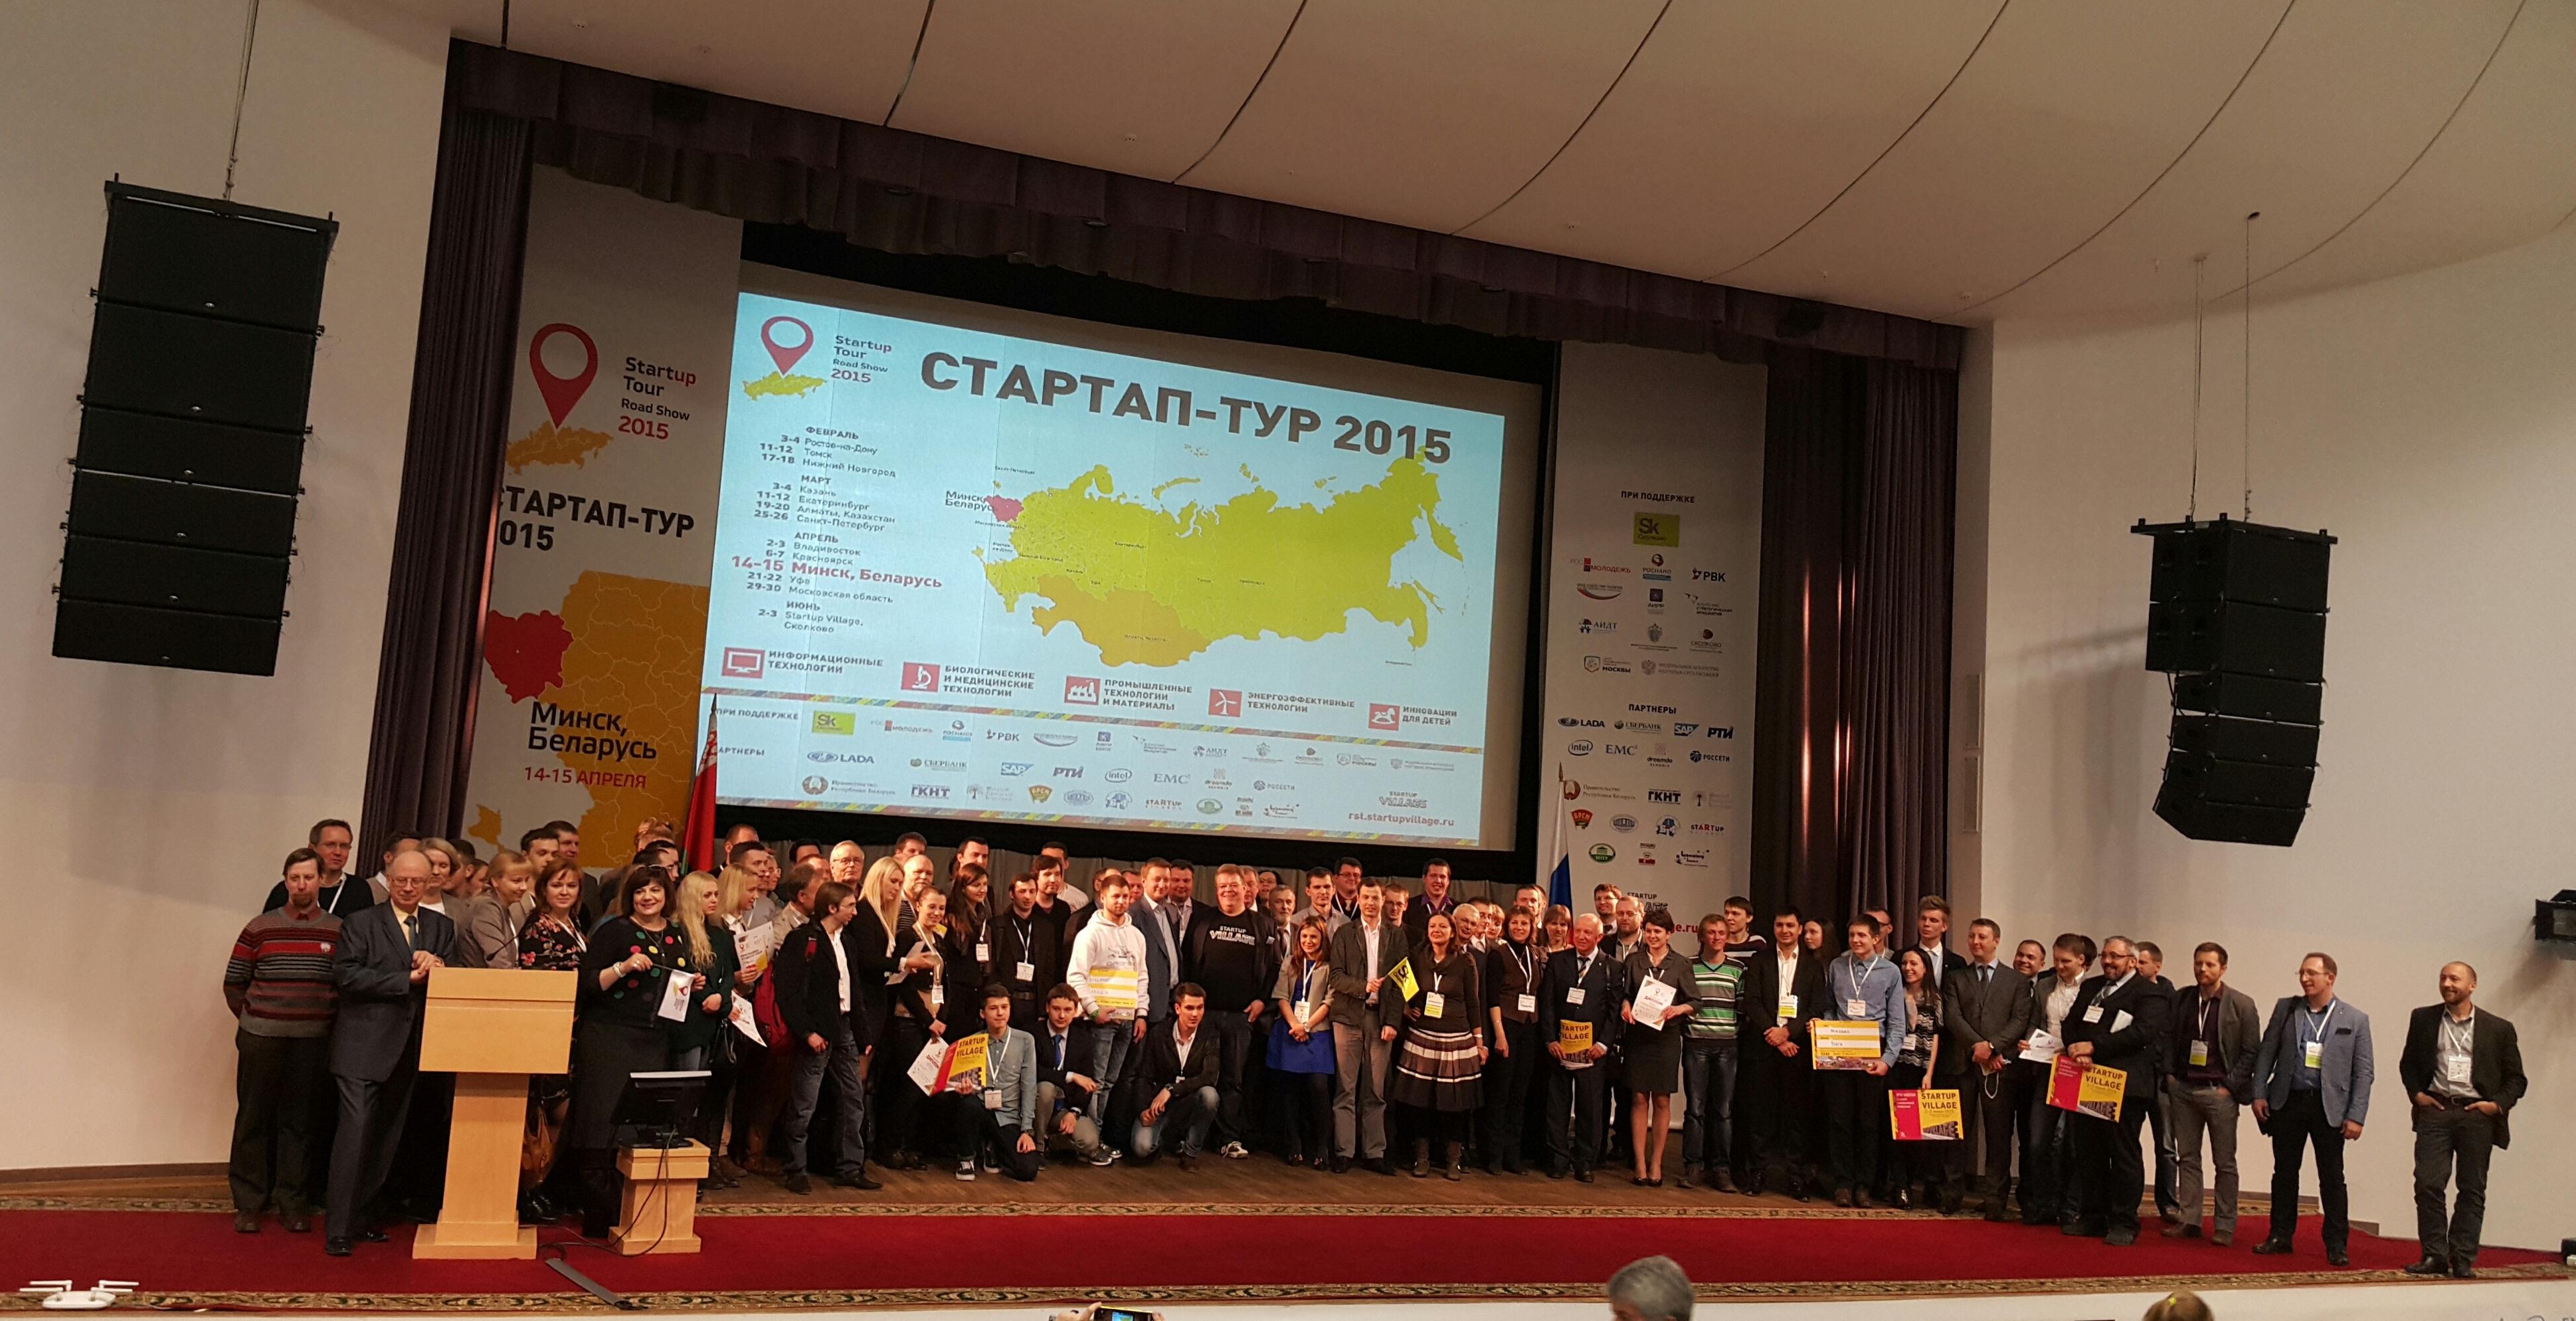 StartUp Tour Minsk - Награждение финалистов